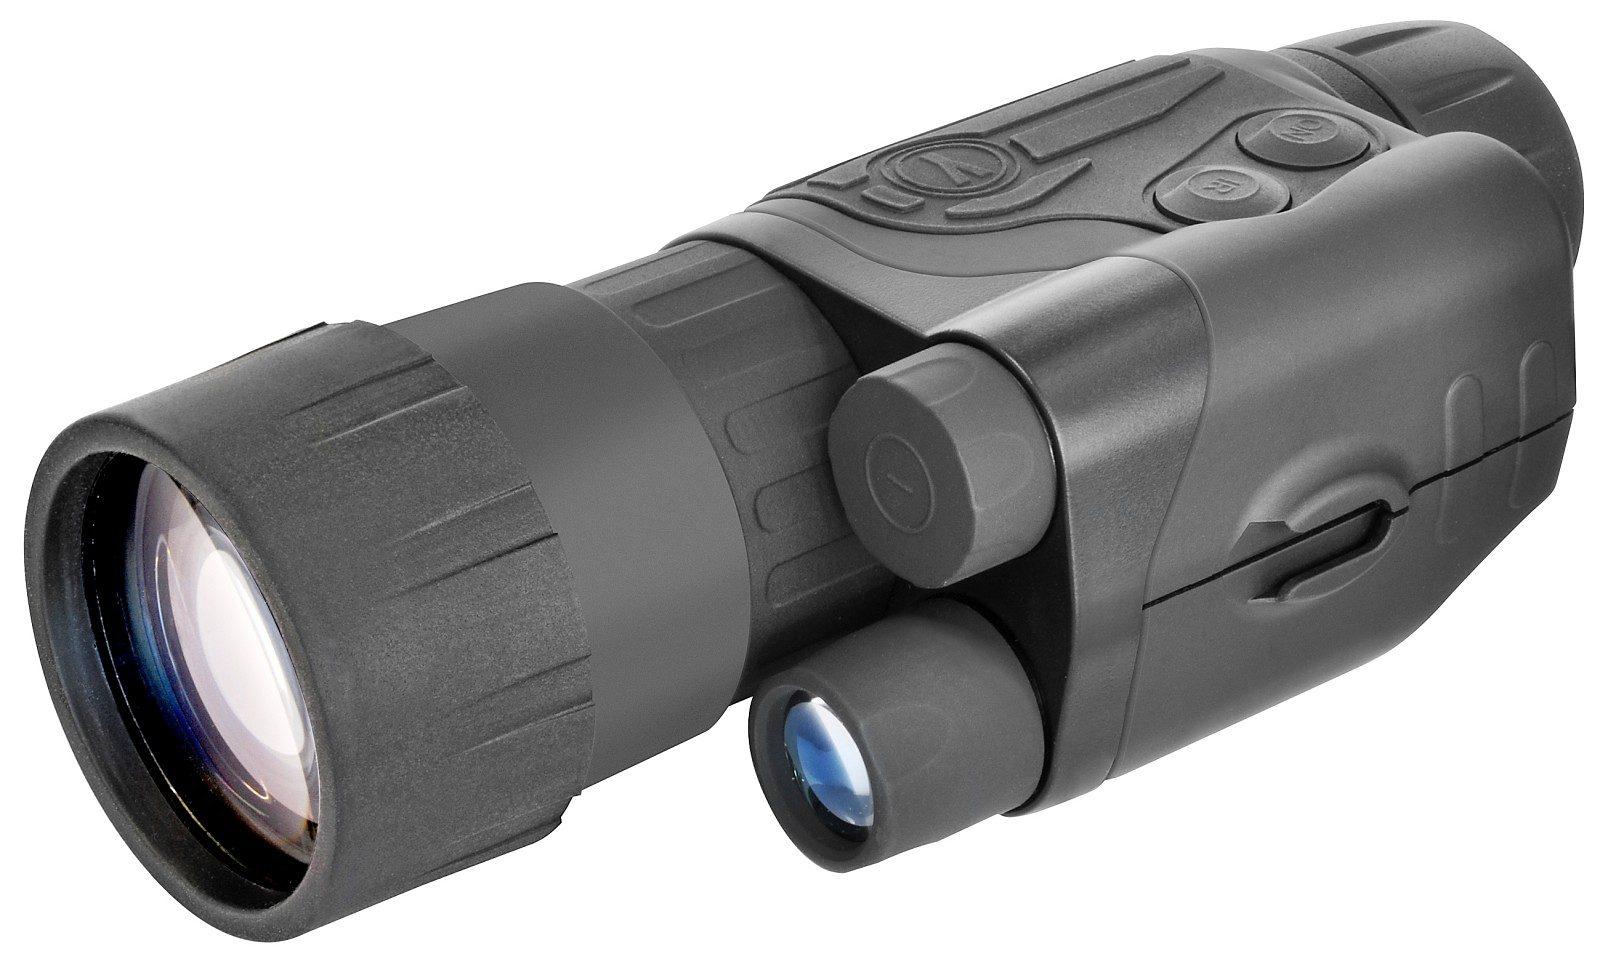 BRESSER Nachtsichtgerät »YUKON NVMT Spartan 3x50 Gen 2+ Nachtsichtgerät«